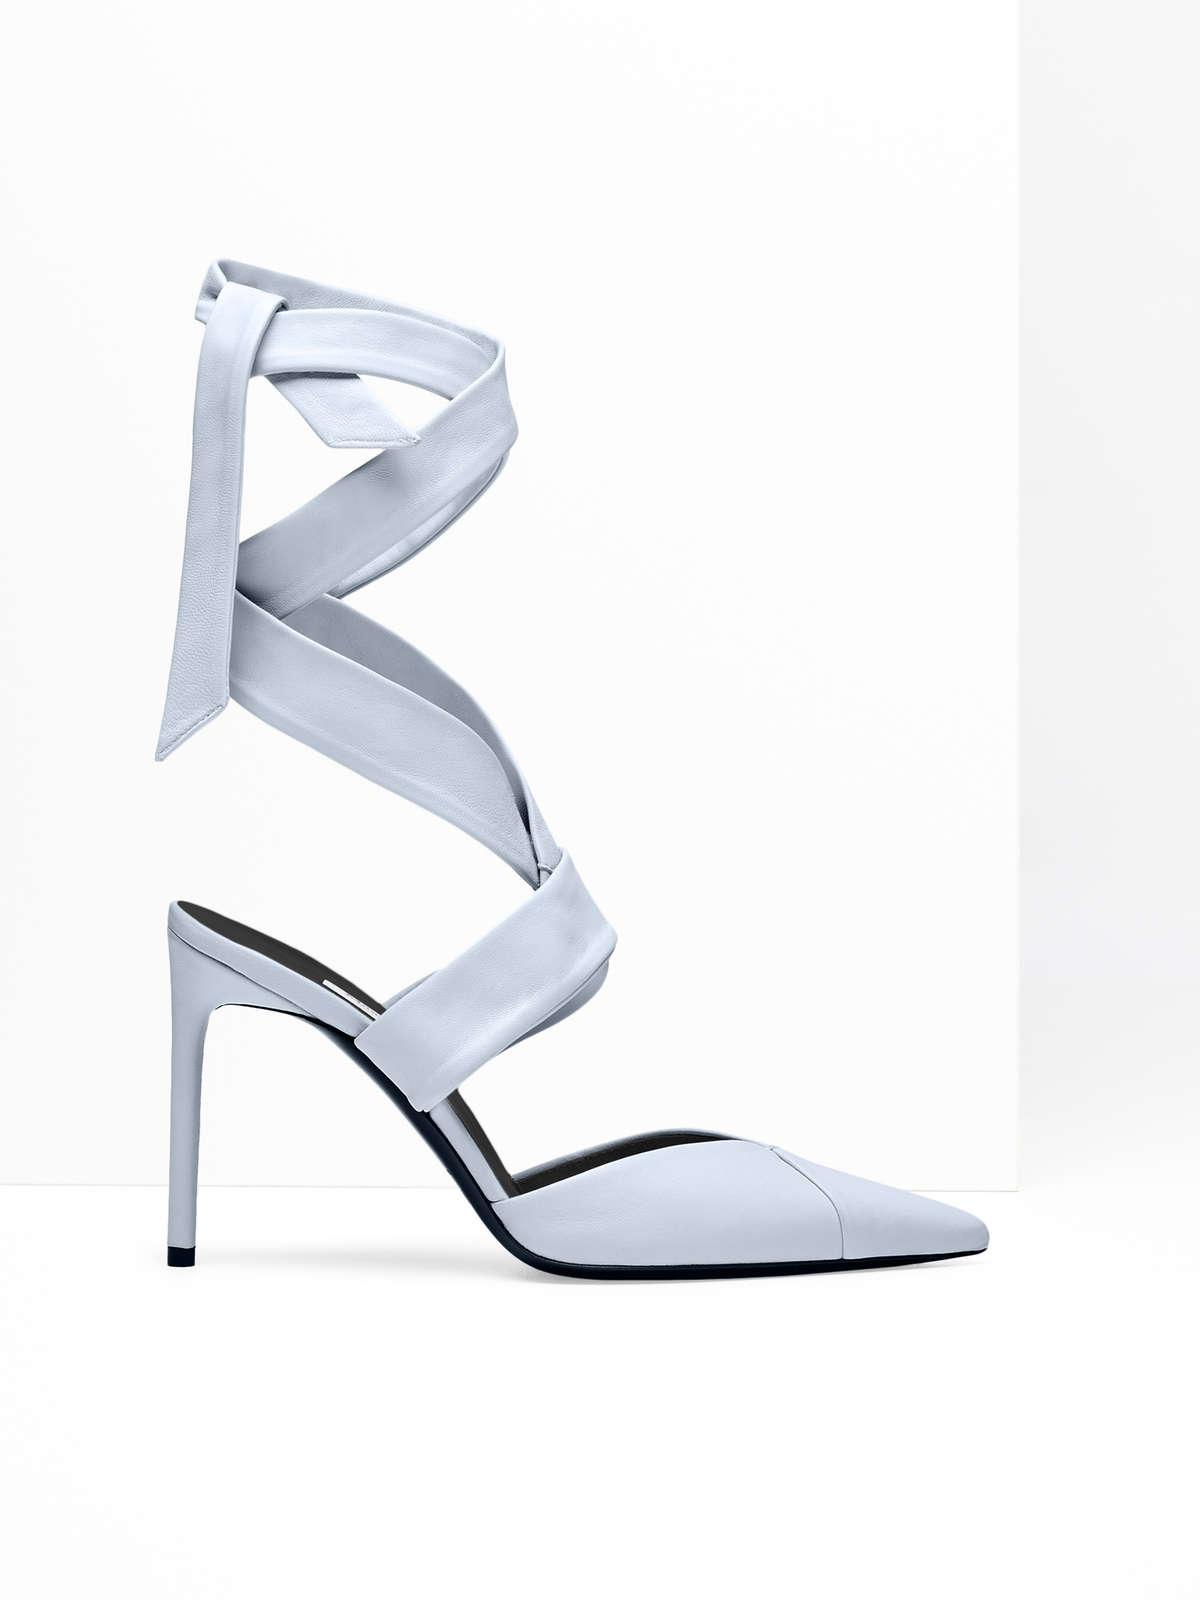 Zapato escotado de napa